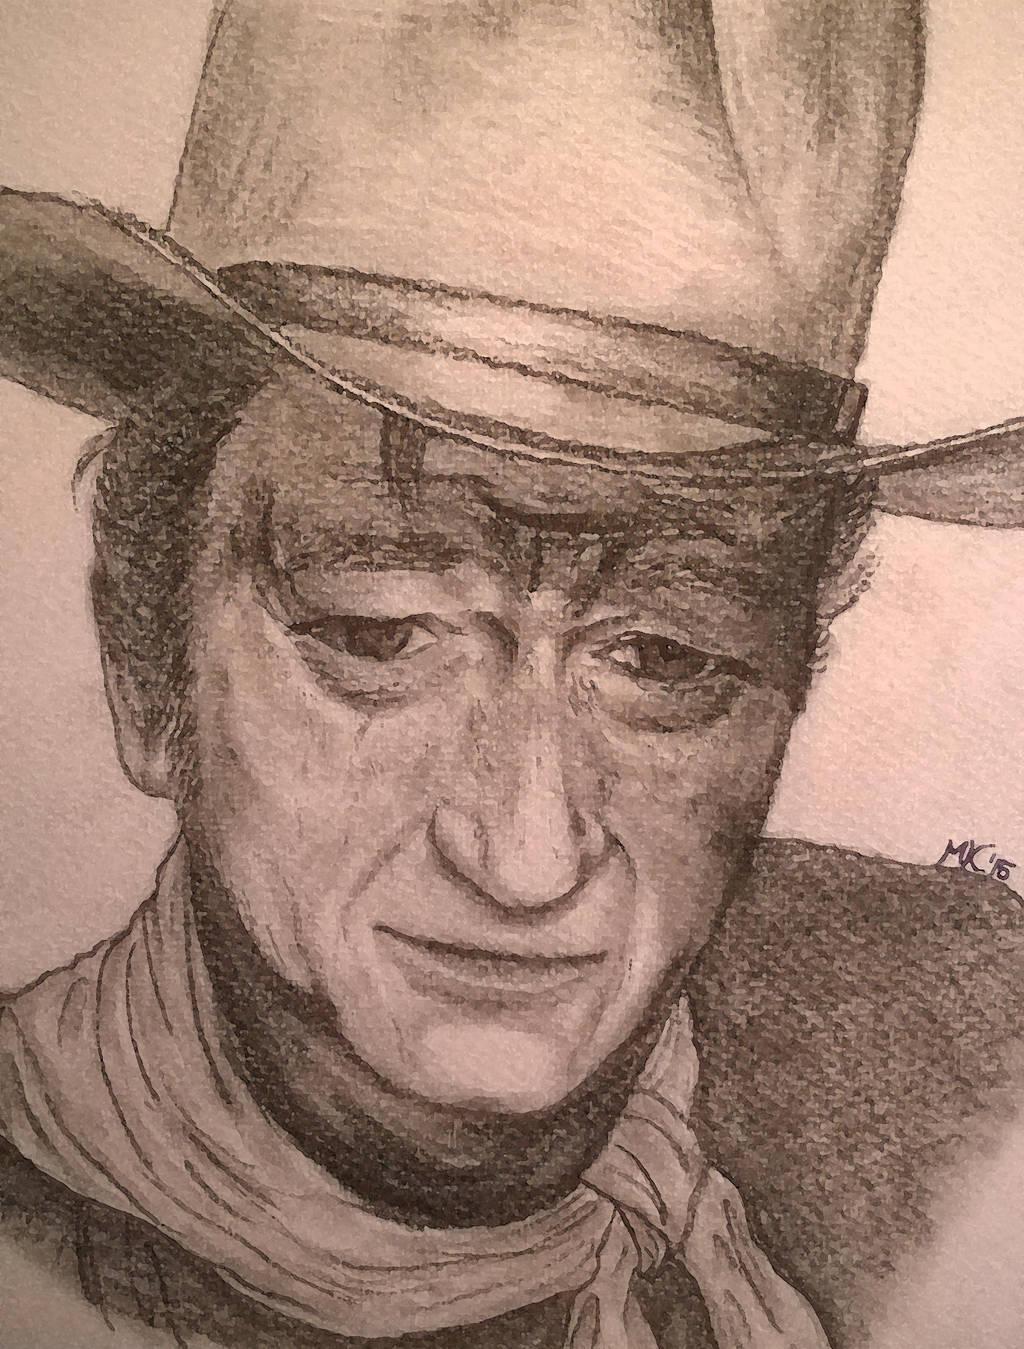 John Wayne by g33kgirl1980